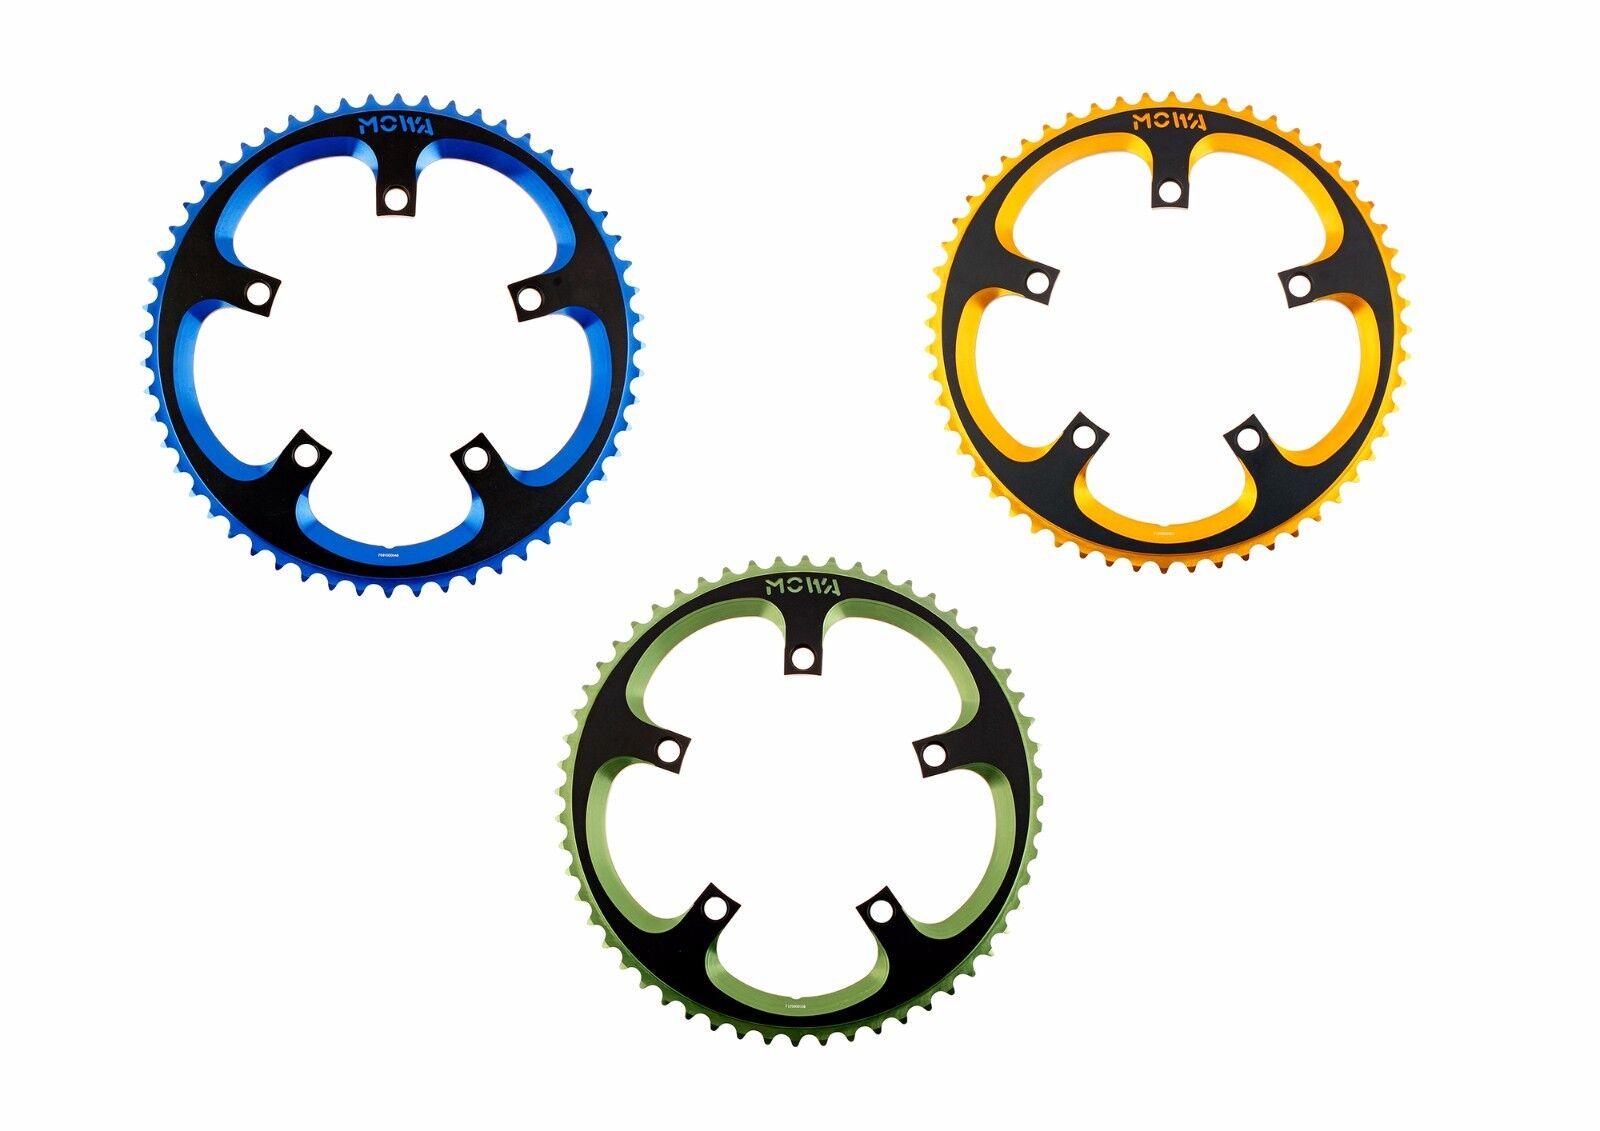 MOWA Road Cyclocross CX Bicycle Bike Chainwheel Cycling Chainring 56T 9 10 speed